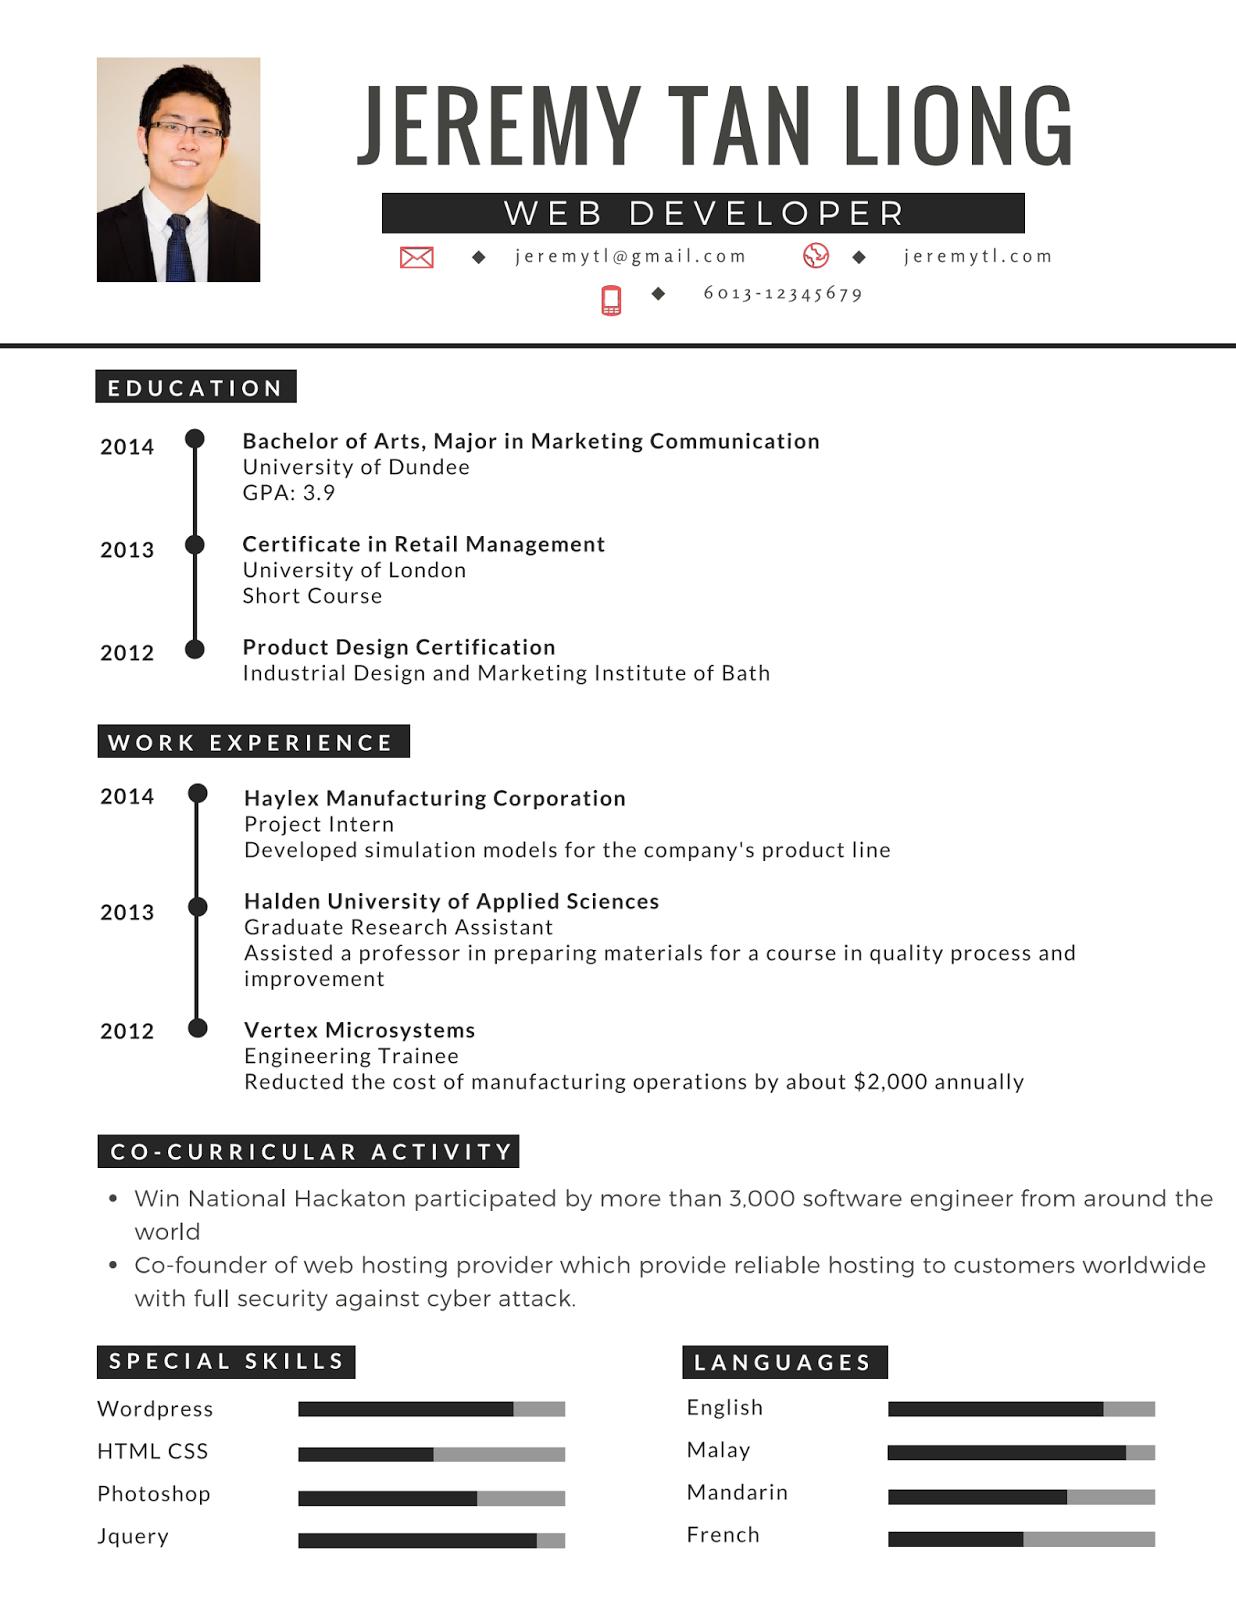 Contoh Resume Terbaik : contoh, resume, terbaik, Contoh, Resume, Terbaik,, Lengkap, Terkini, Riwayat, Hidup,, Template,, Desain